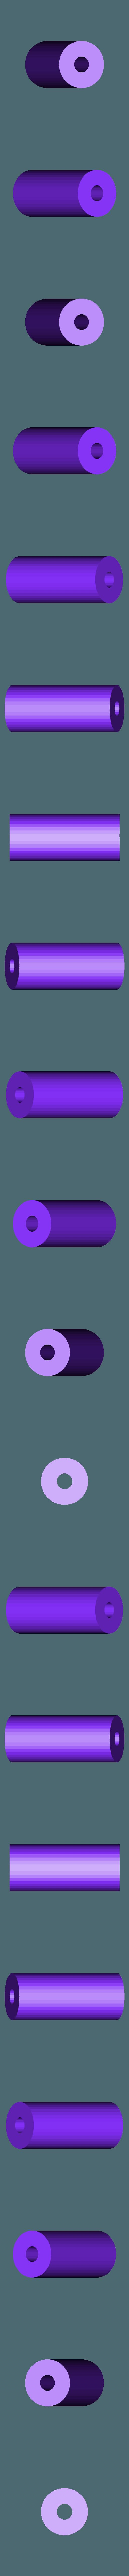 rulli.stl Download free STL file Anycubic I3 Mega - Guida filo • 3D printing object, Scigola